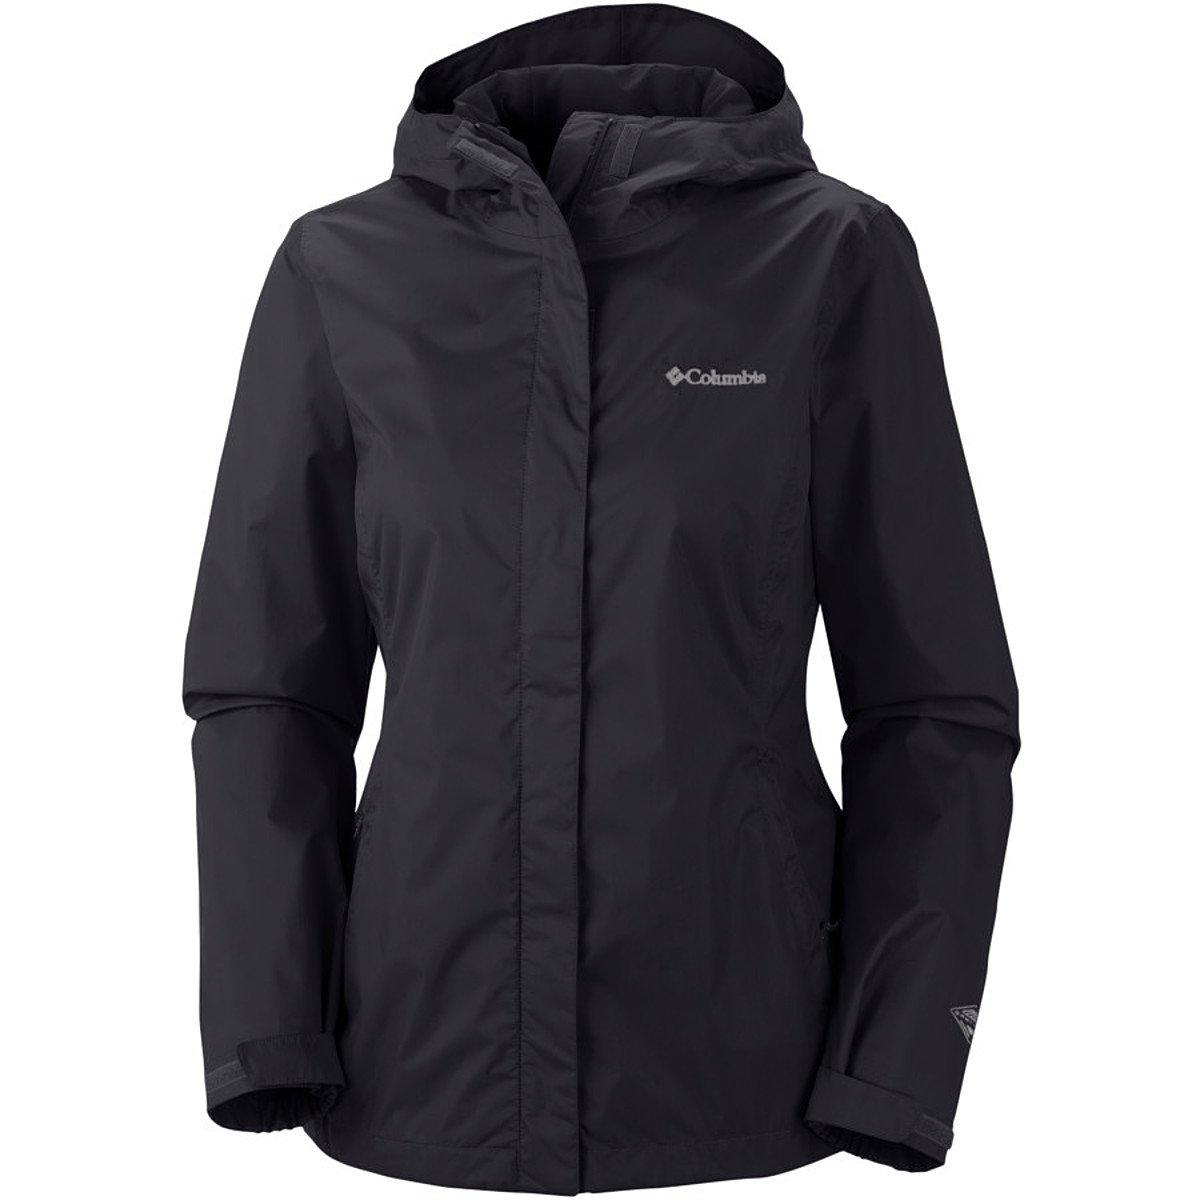 Columbia Women's Arcadia II Waterproof Breathable Jacket with Packable Hood, Black, Medium by Columbia